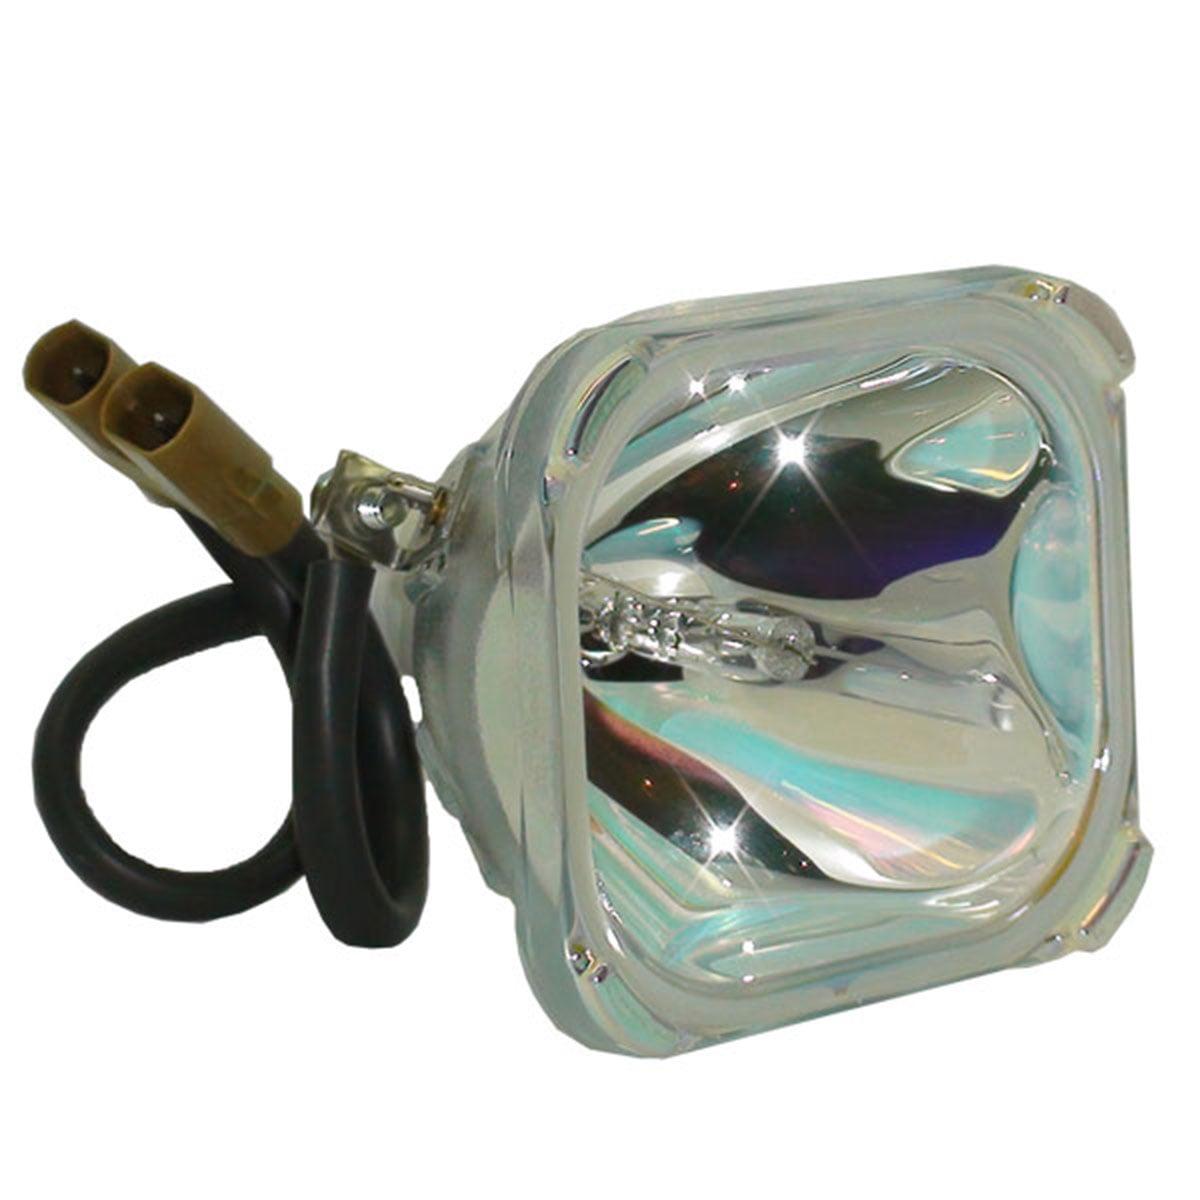 Original Philips TV Lamp Replacement for Panasonic PT-60LC13 (Bulb Only) - image 1 de 5